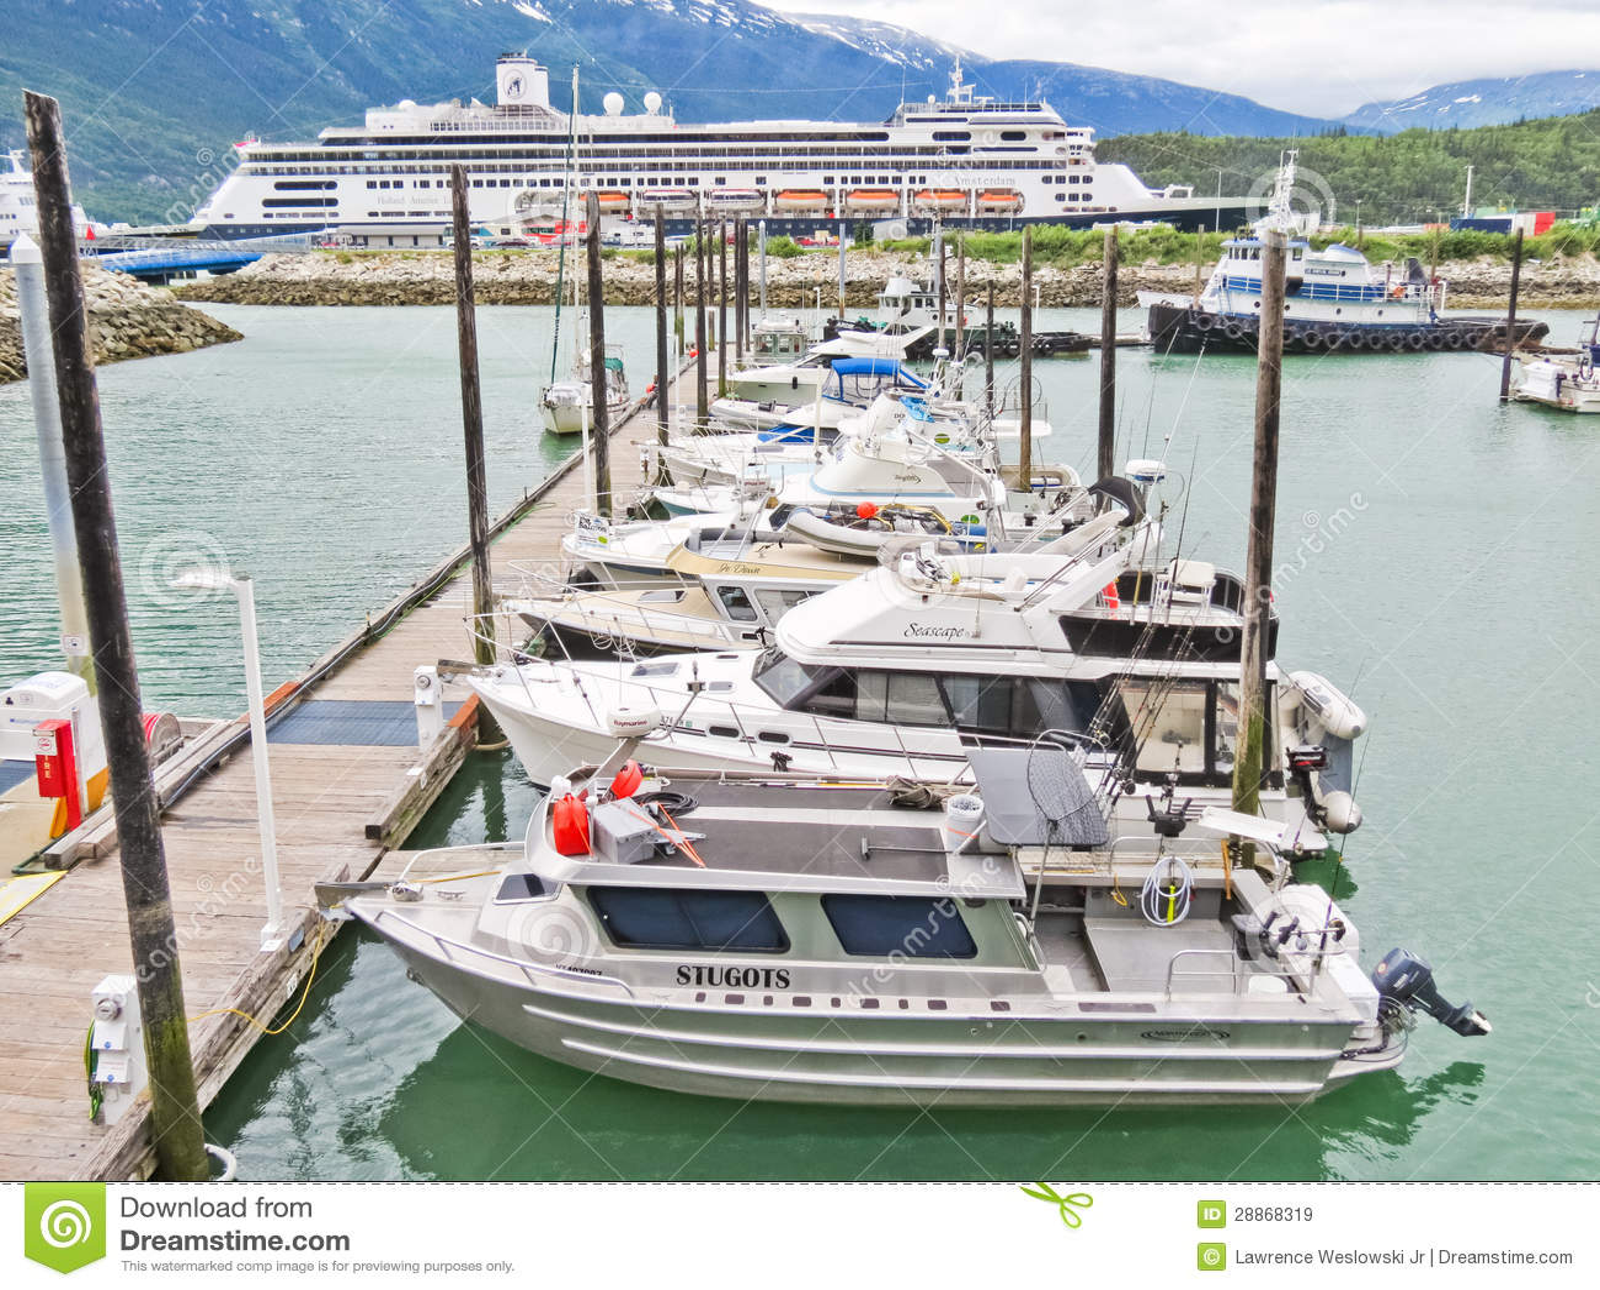 Alaska Skagway Small Boat Harbor Map Editorial Stock Image ...